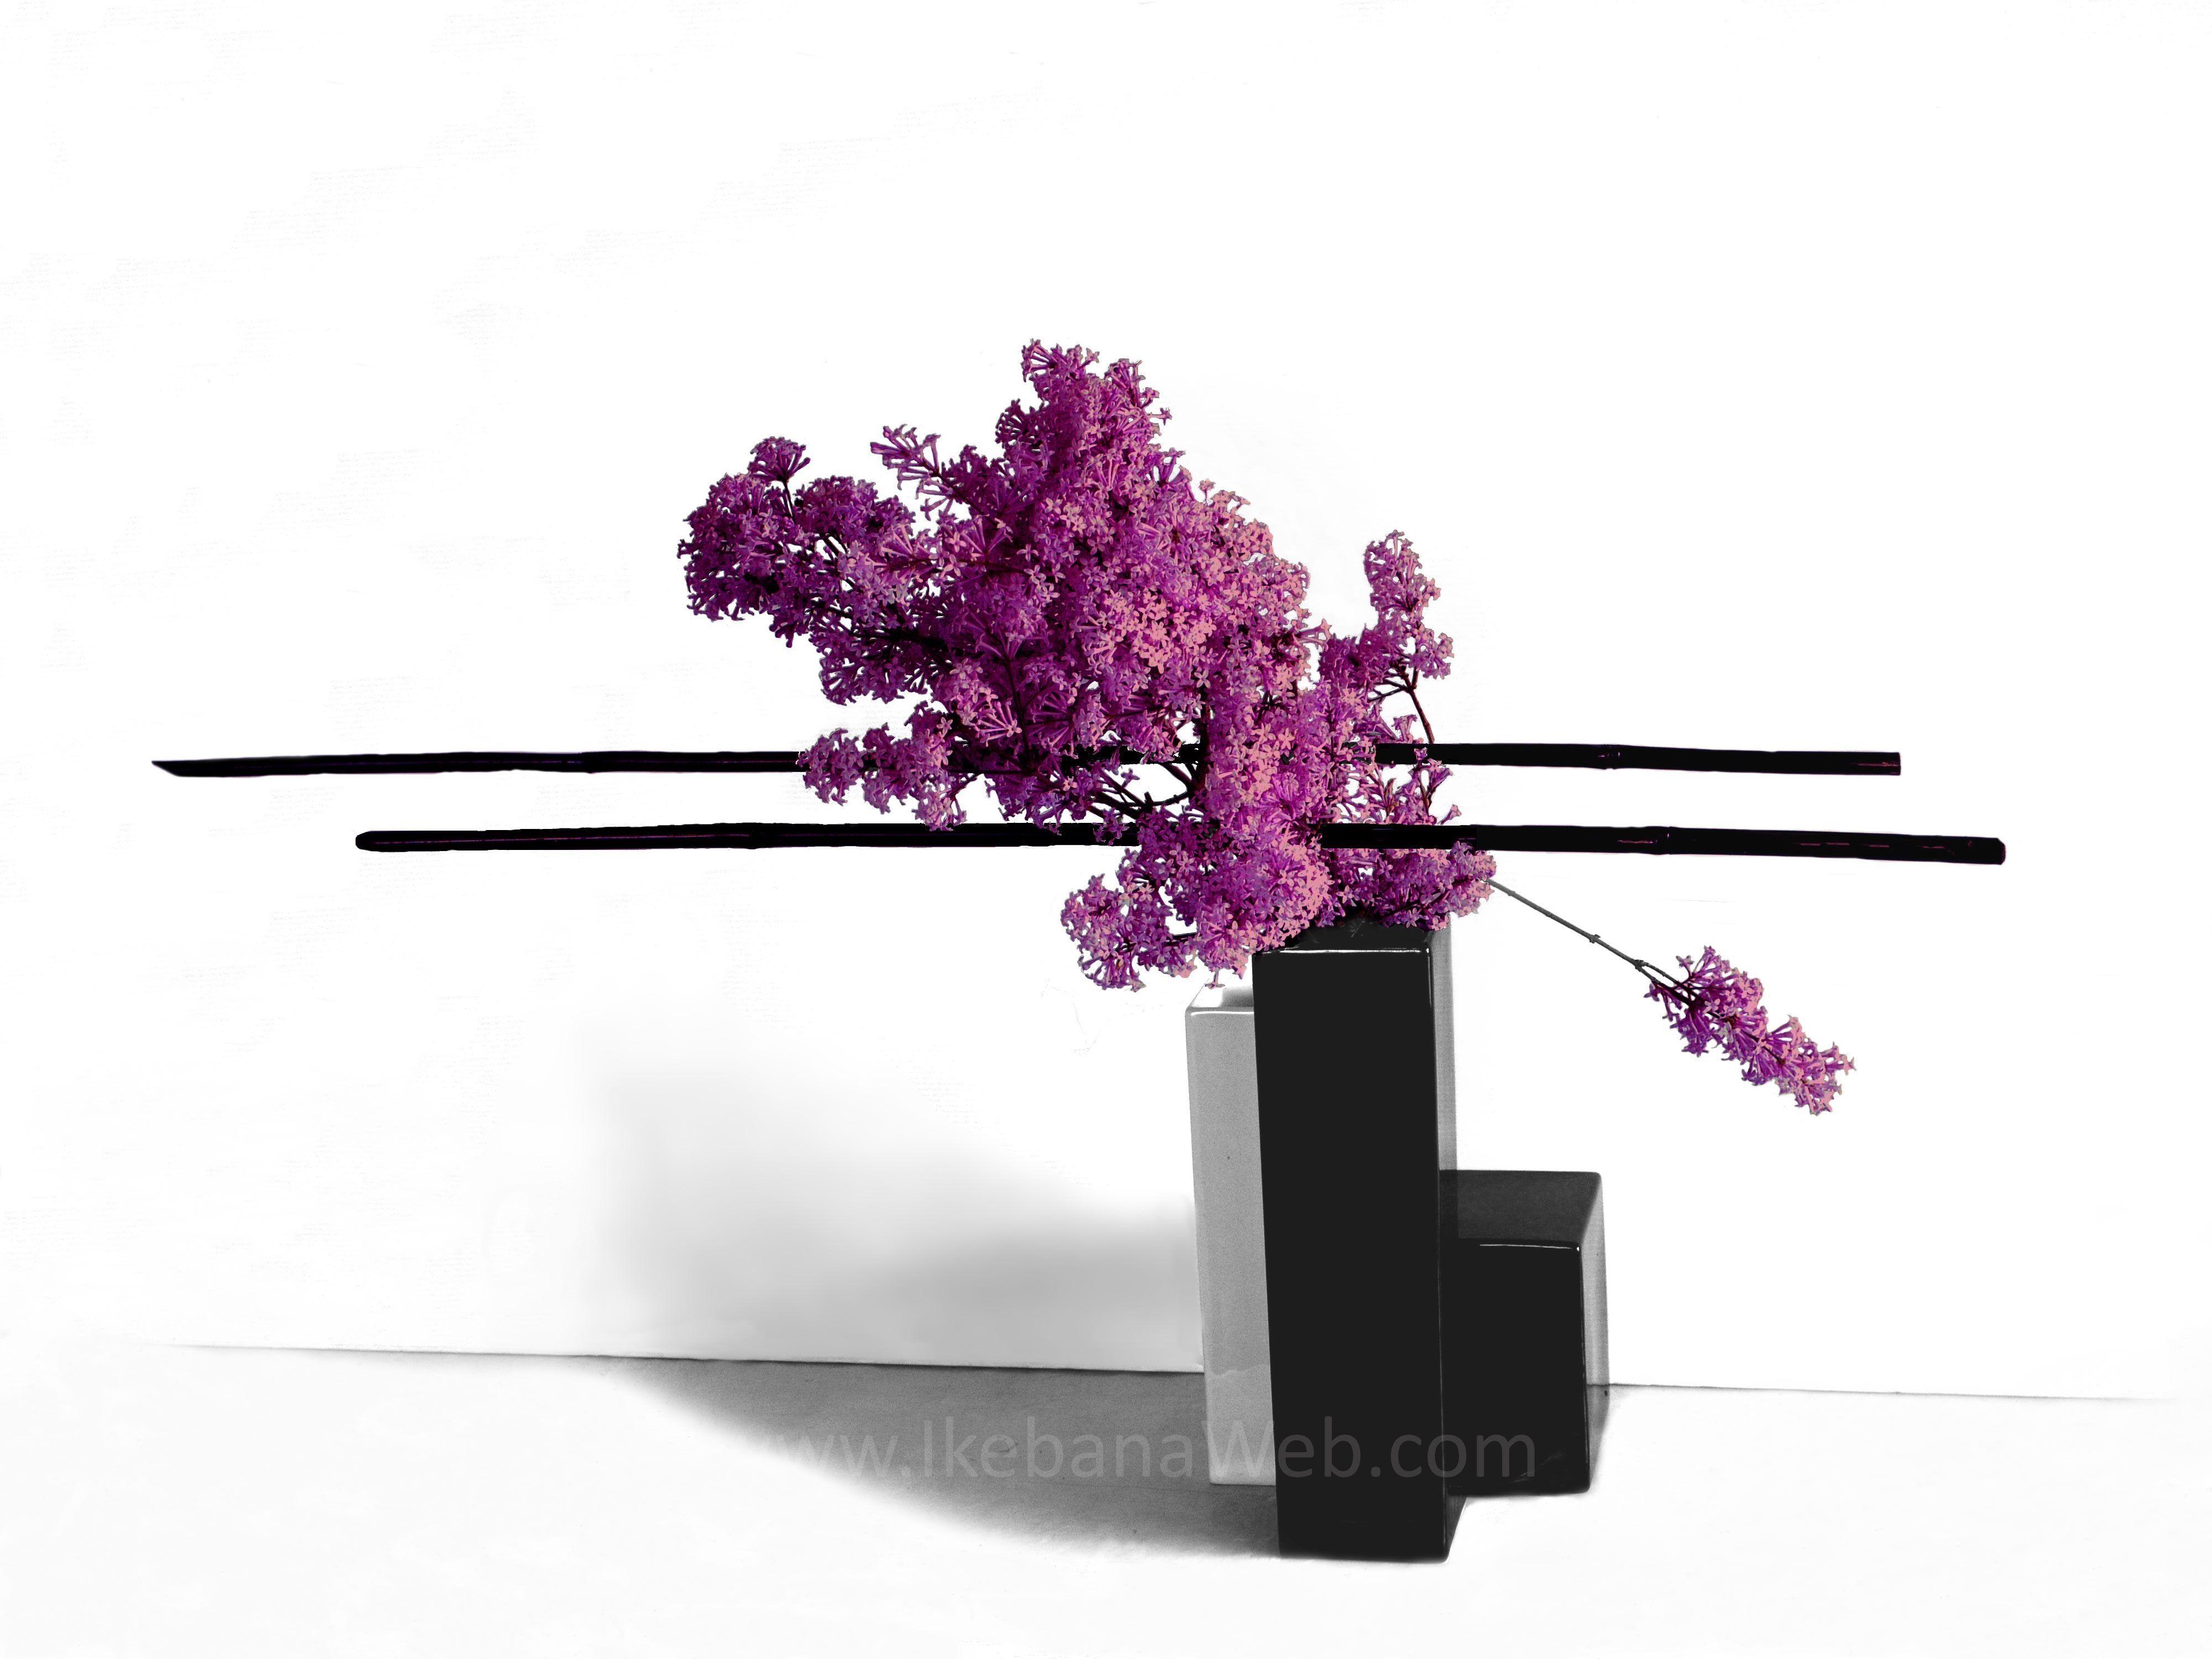 ikebana flower arrangements Sogetsu Mass, Color, Line - 3 main elements.  IkebanaWeb.com